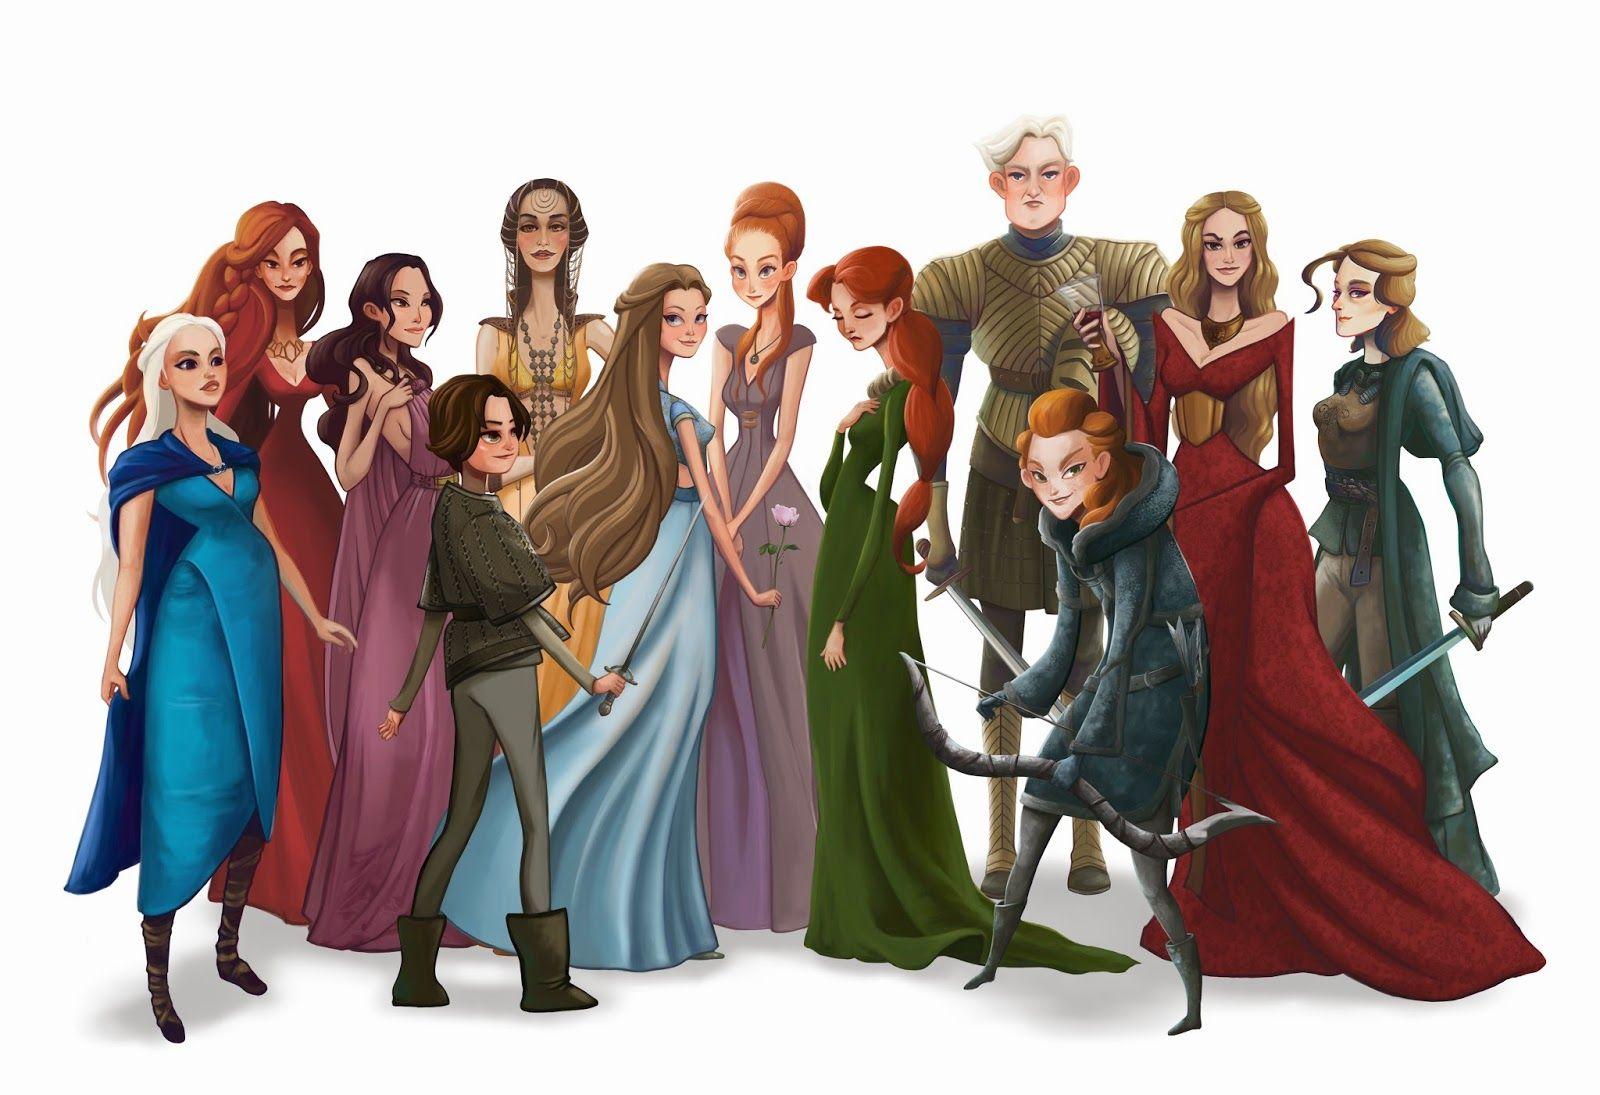 game of thrones illustration - Buscar con Google